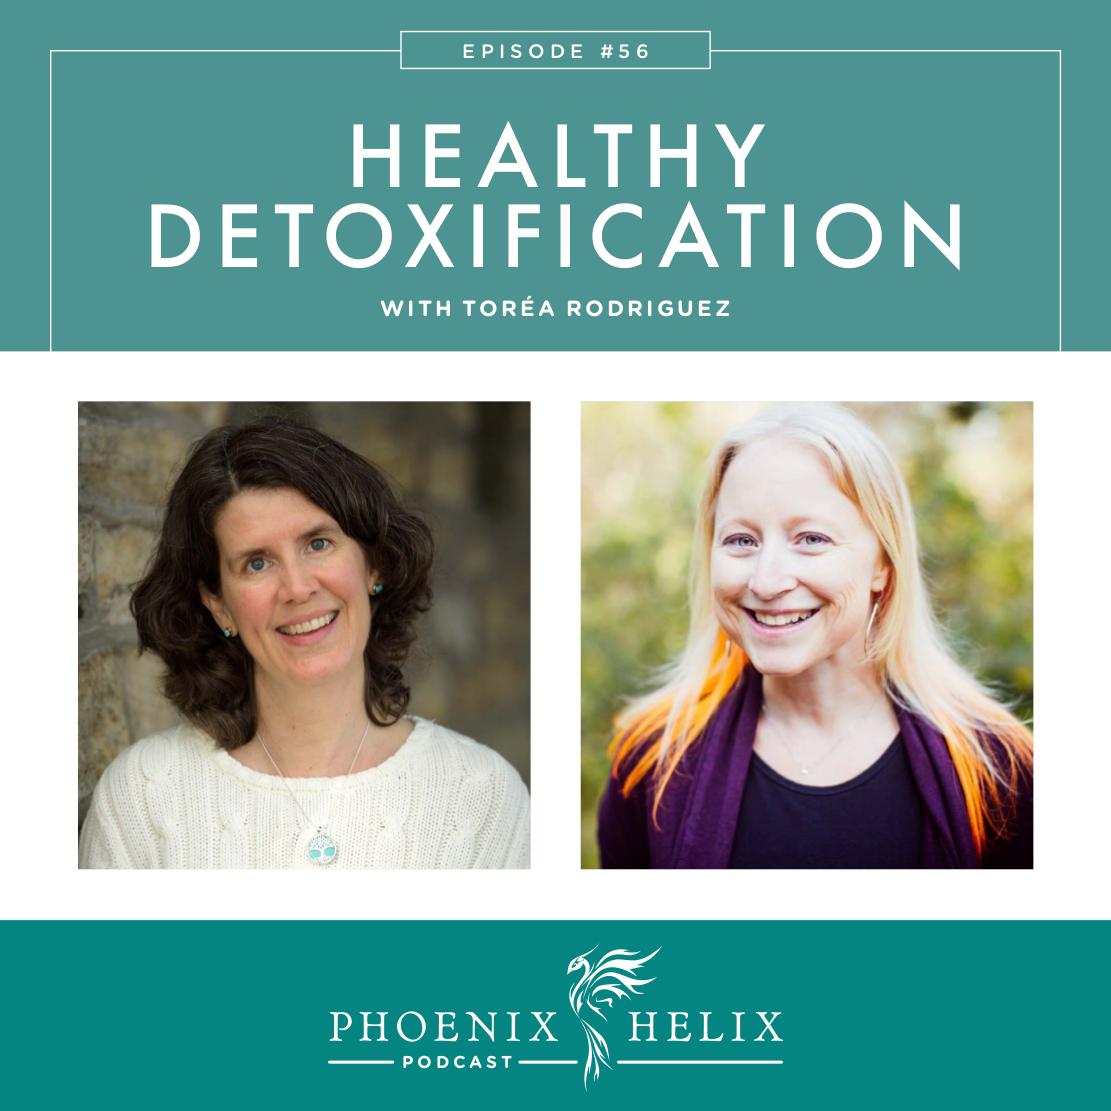 Healthy Detoxification with Torea Rodriguez | Phoenix Helix Podcast